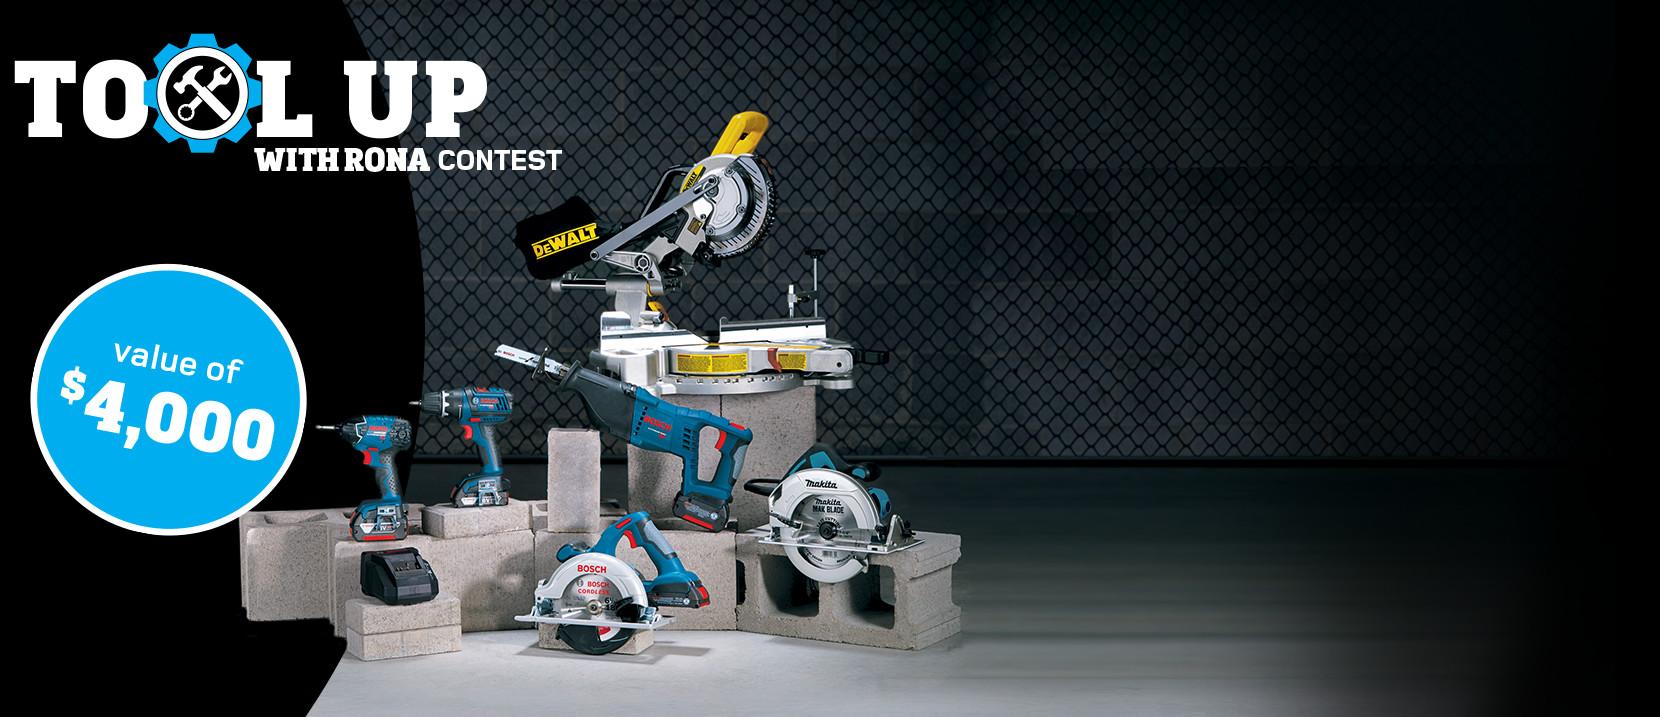 toolup contest rona